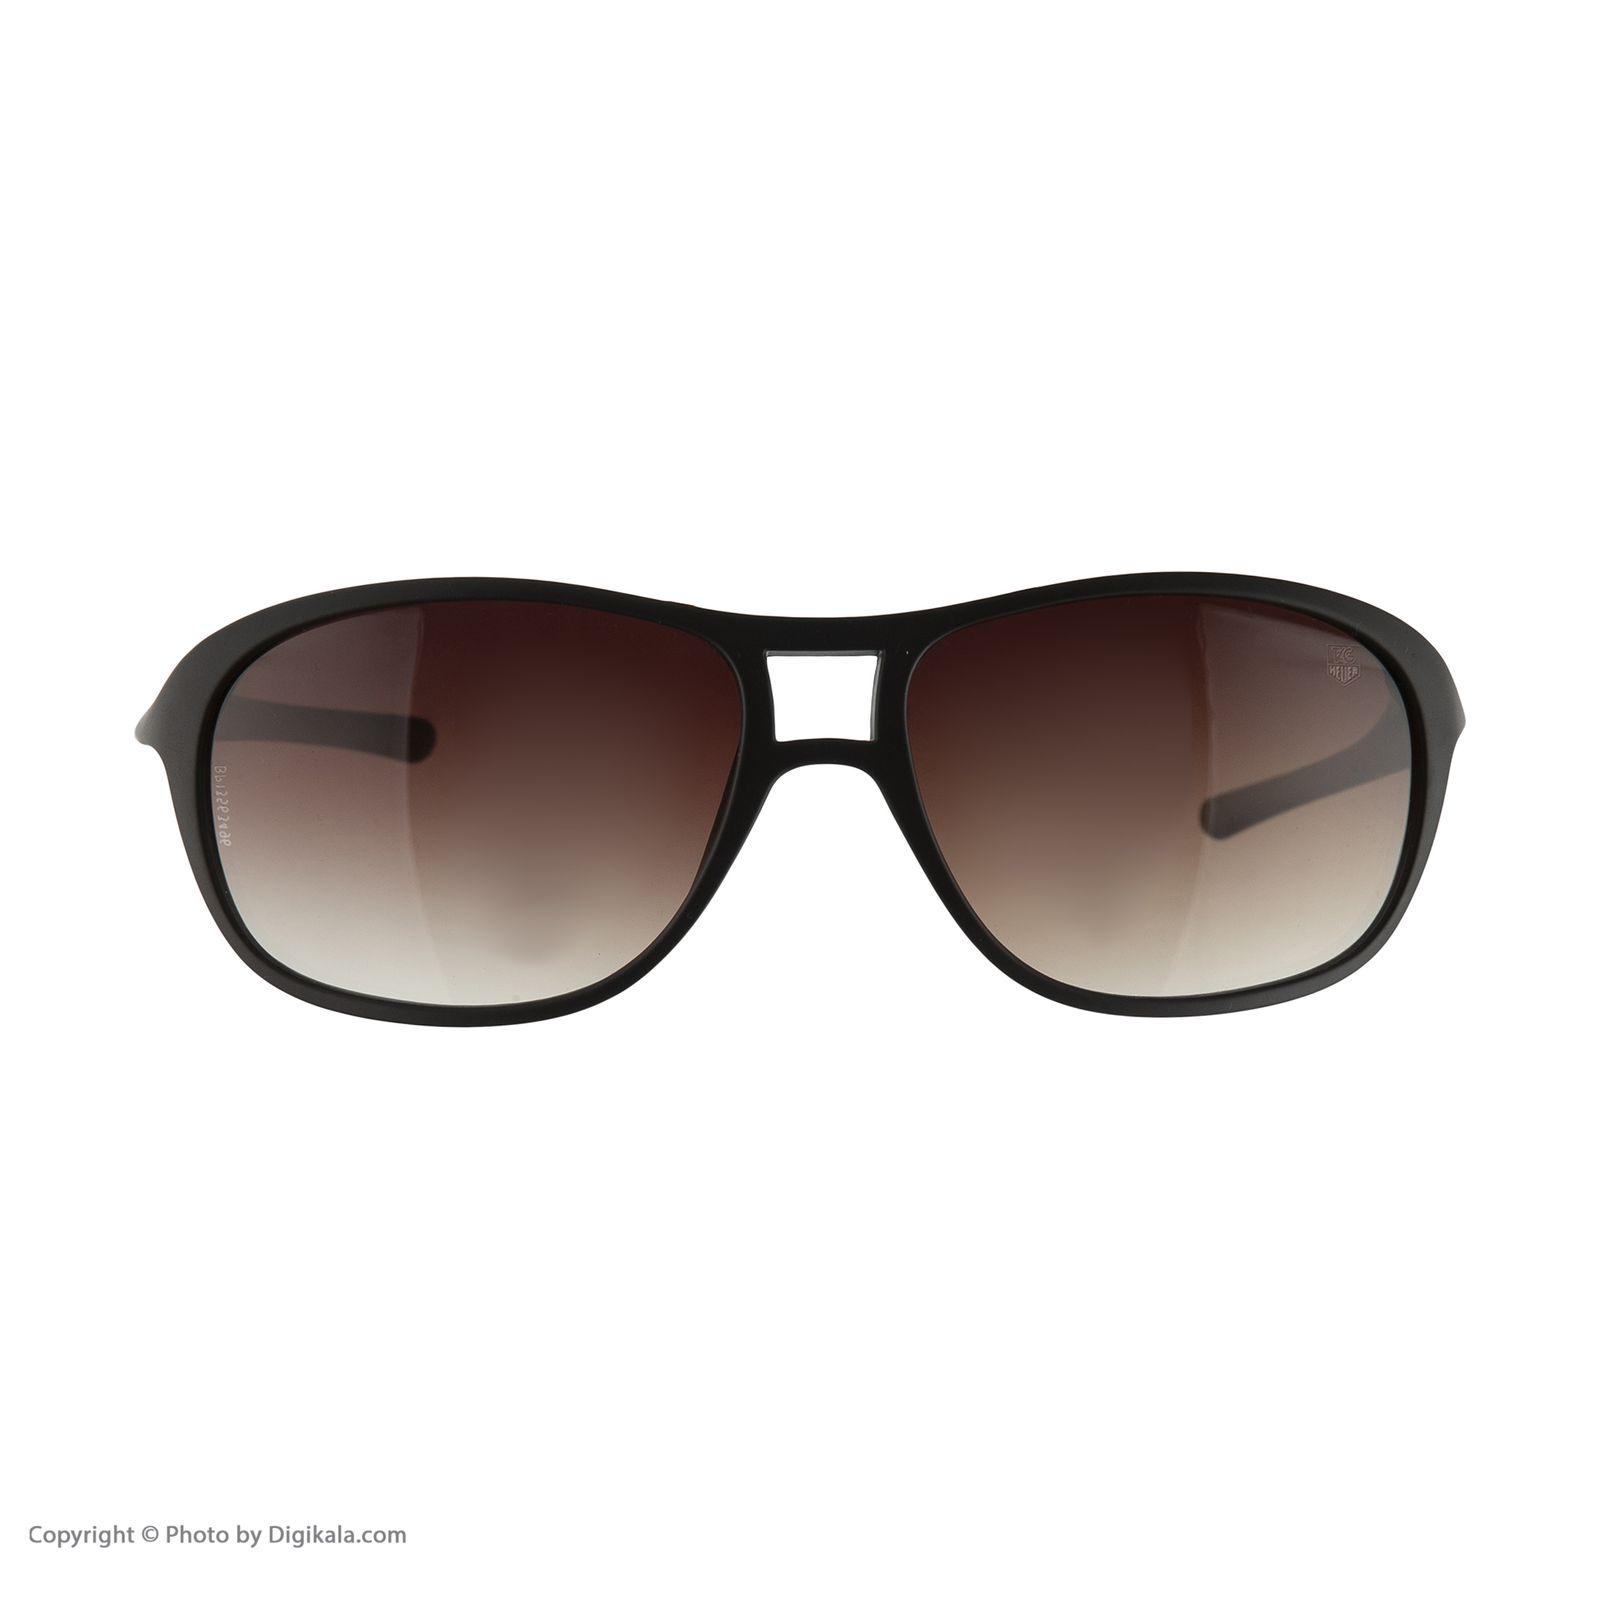 عینک آفتابی تگ هویر مدل 6043 -  - 5